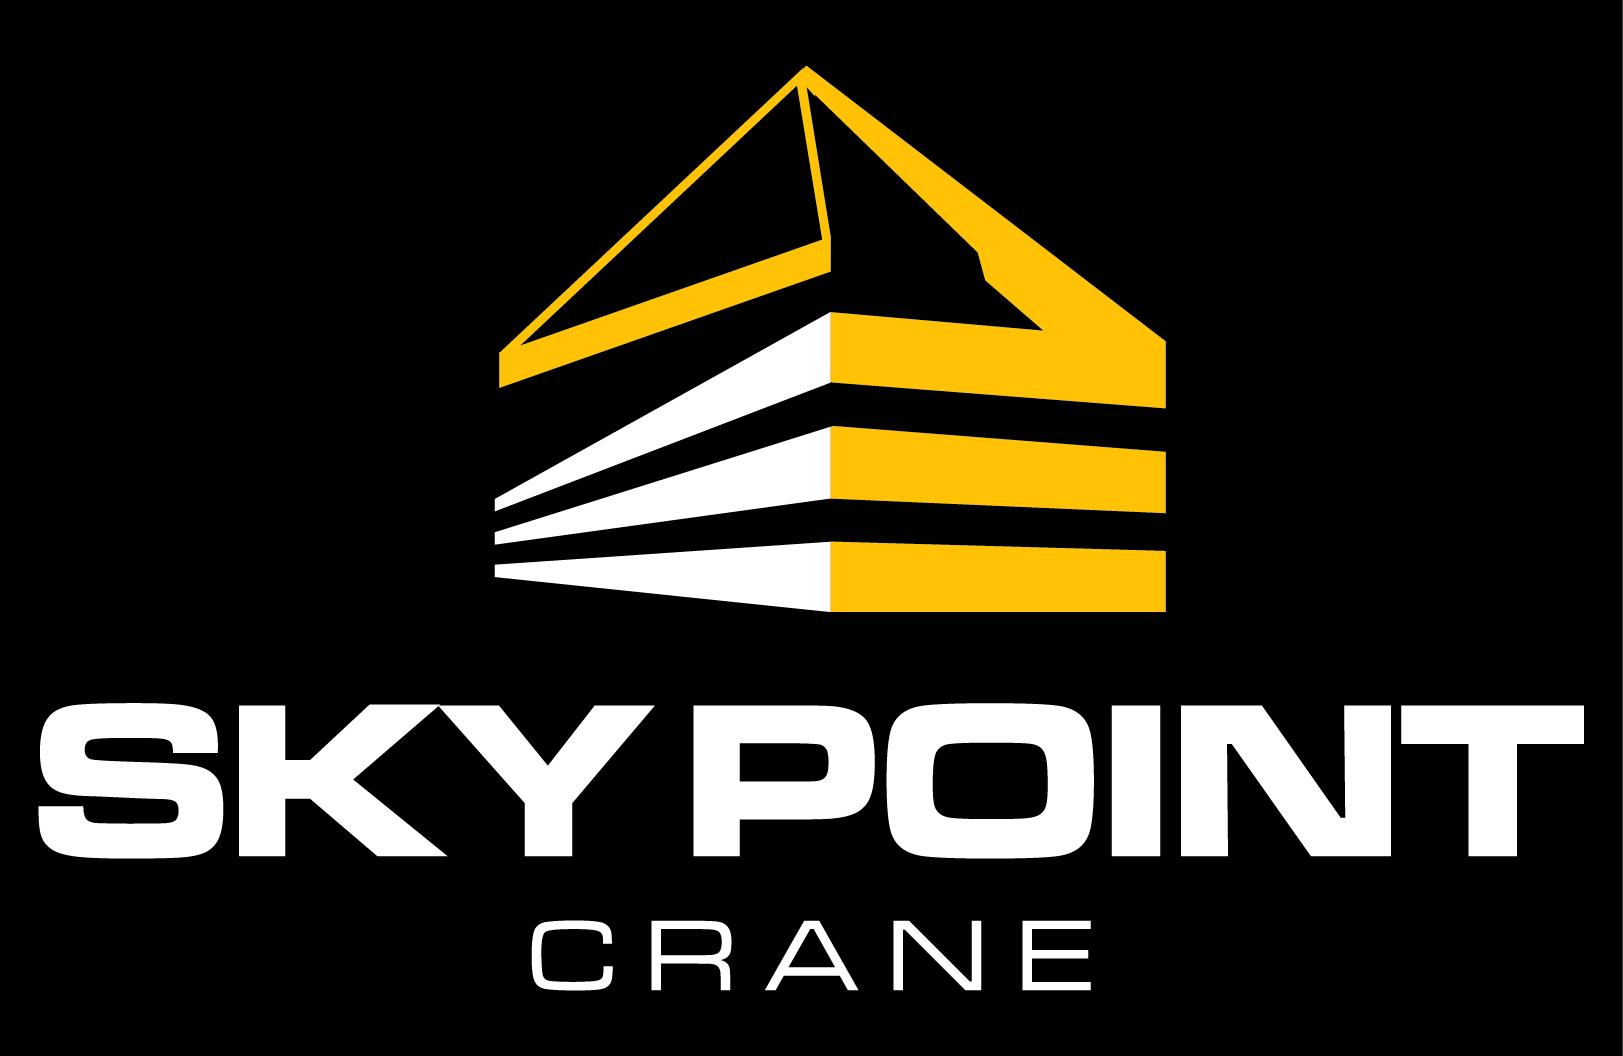 Sky Point Crane